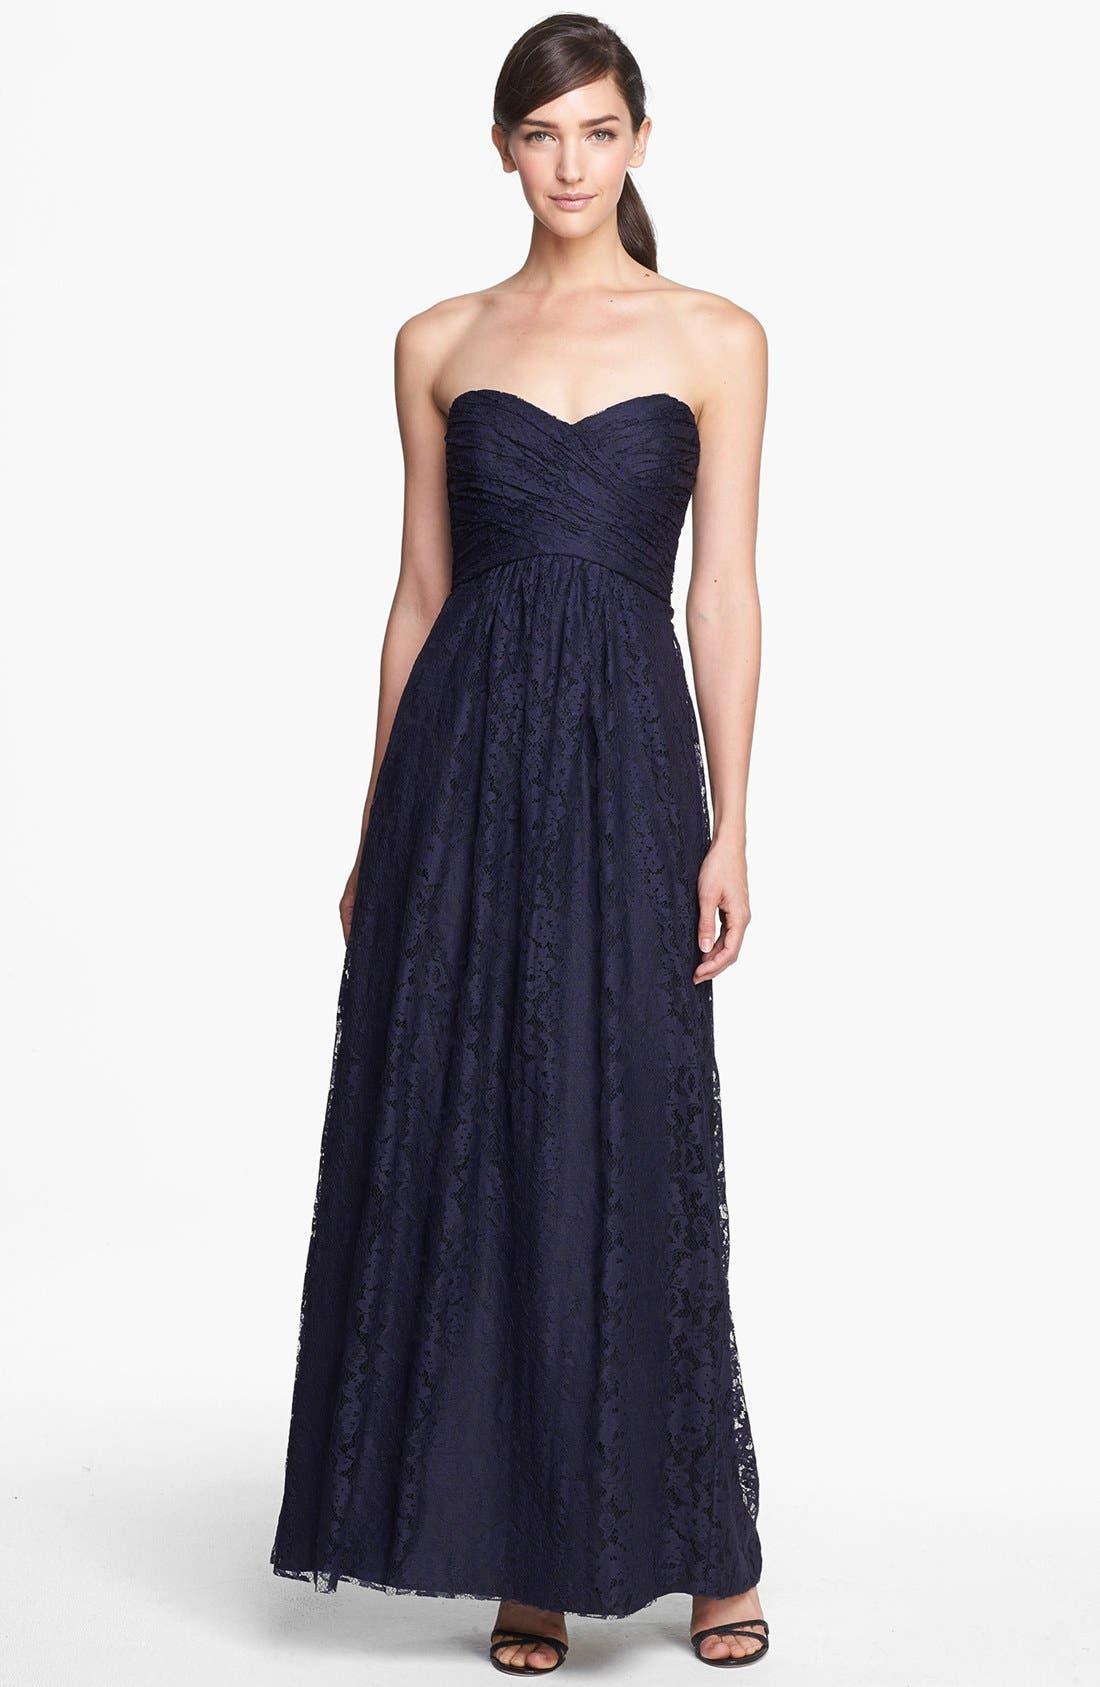 Black Strapless Long Prom Dresses Sweetheart Top